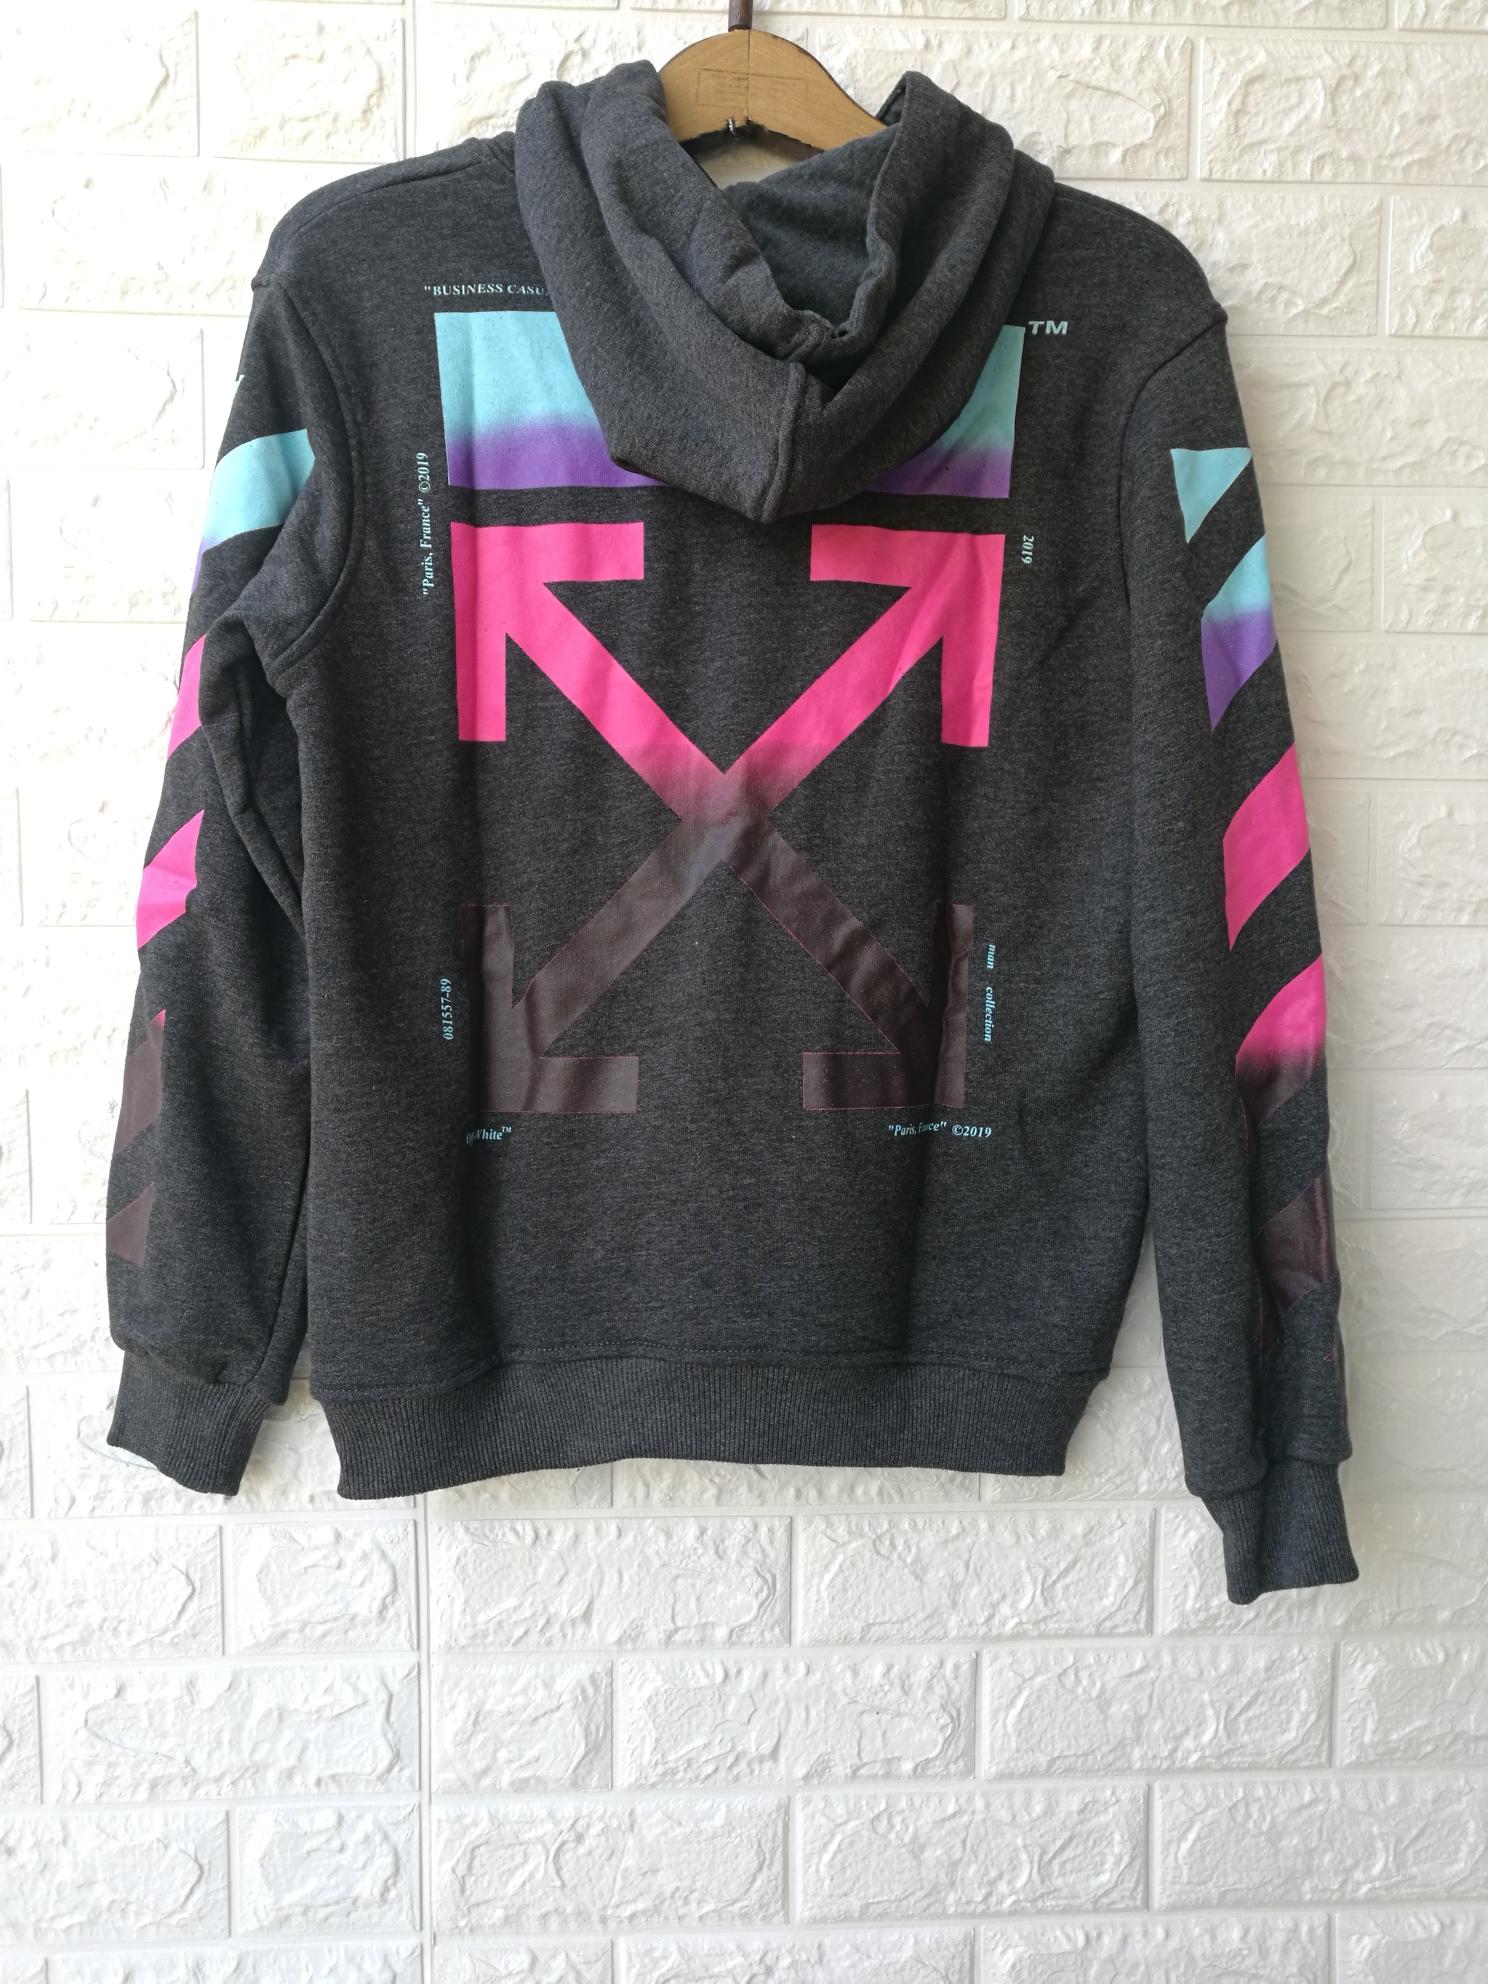 0a7c4ef245ee OFF WHITE Men s Dark Gray Gradient Arrows Sweatshirt Hoodie ...